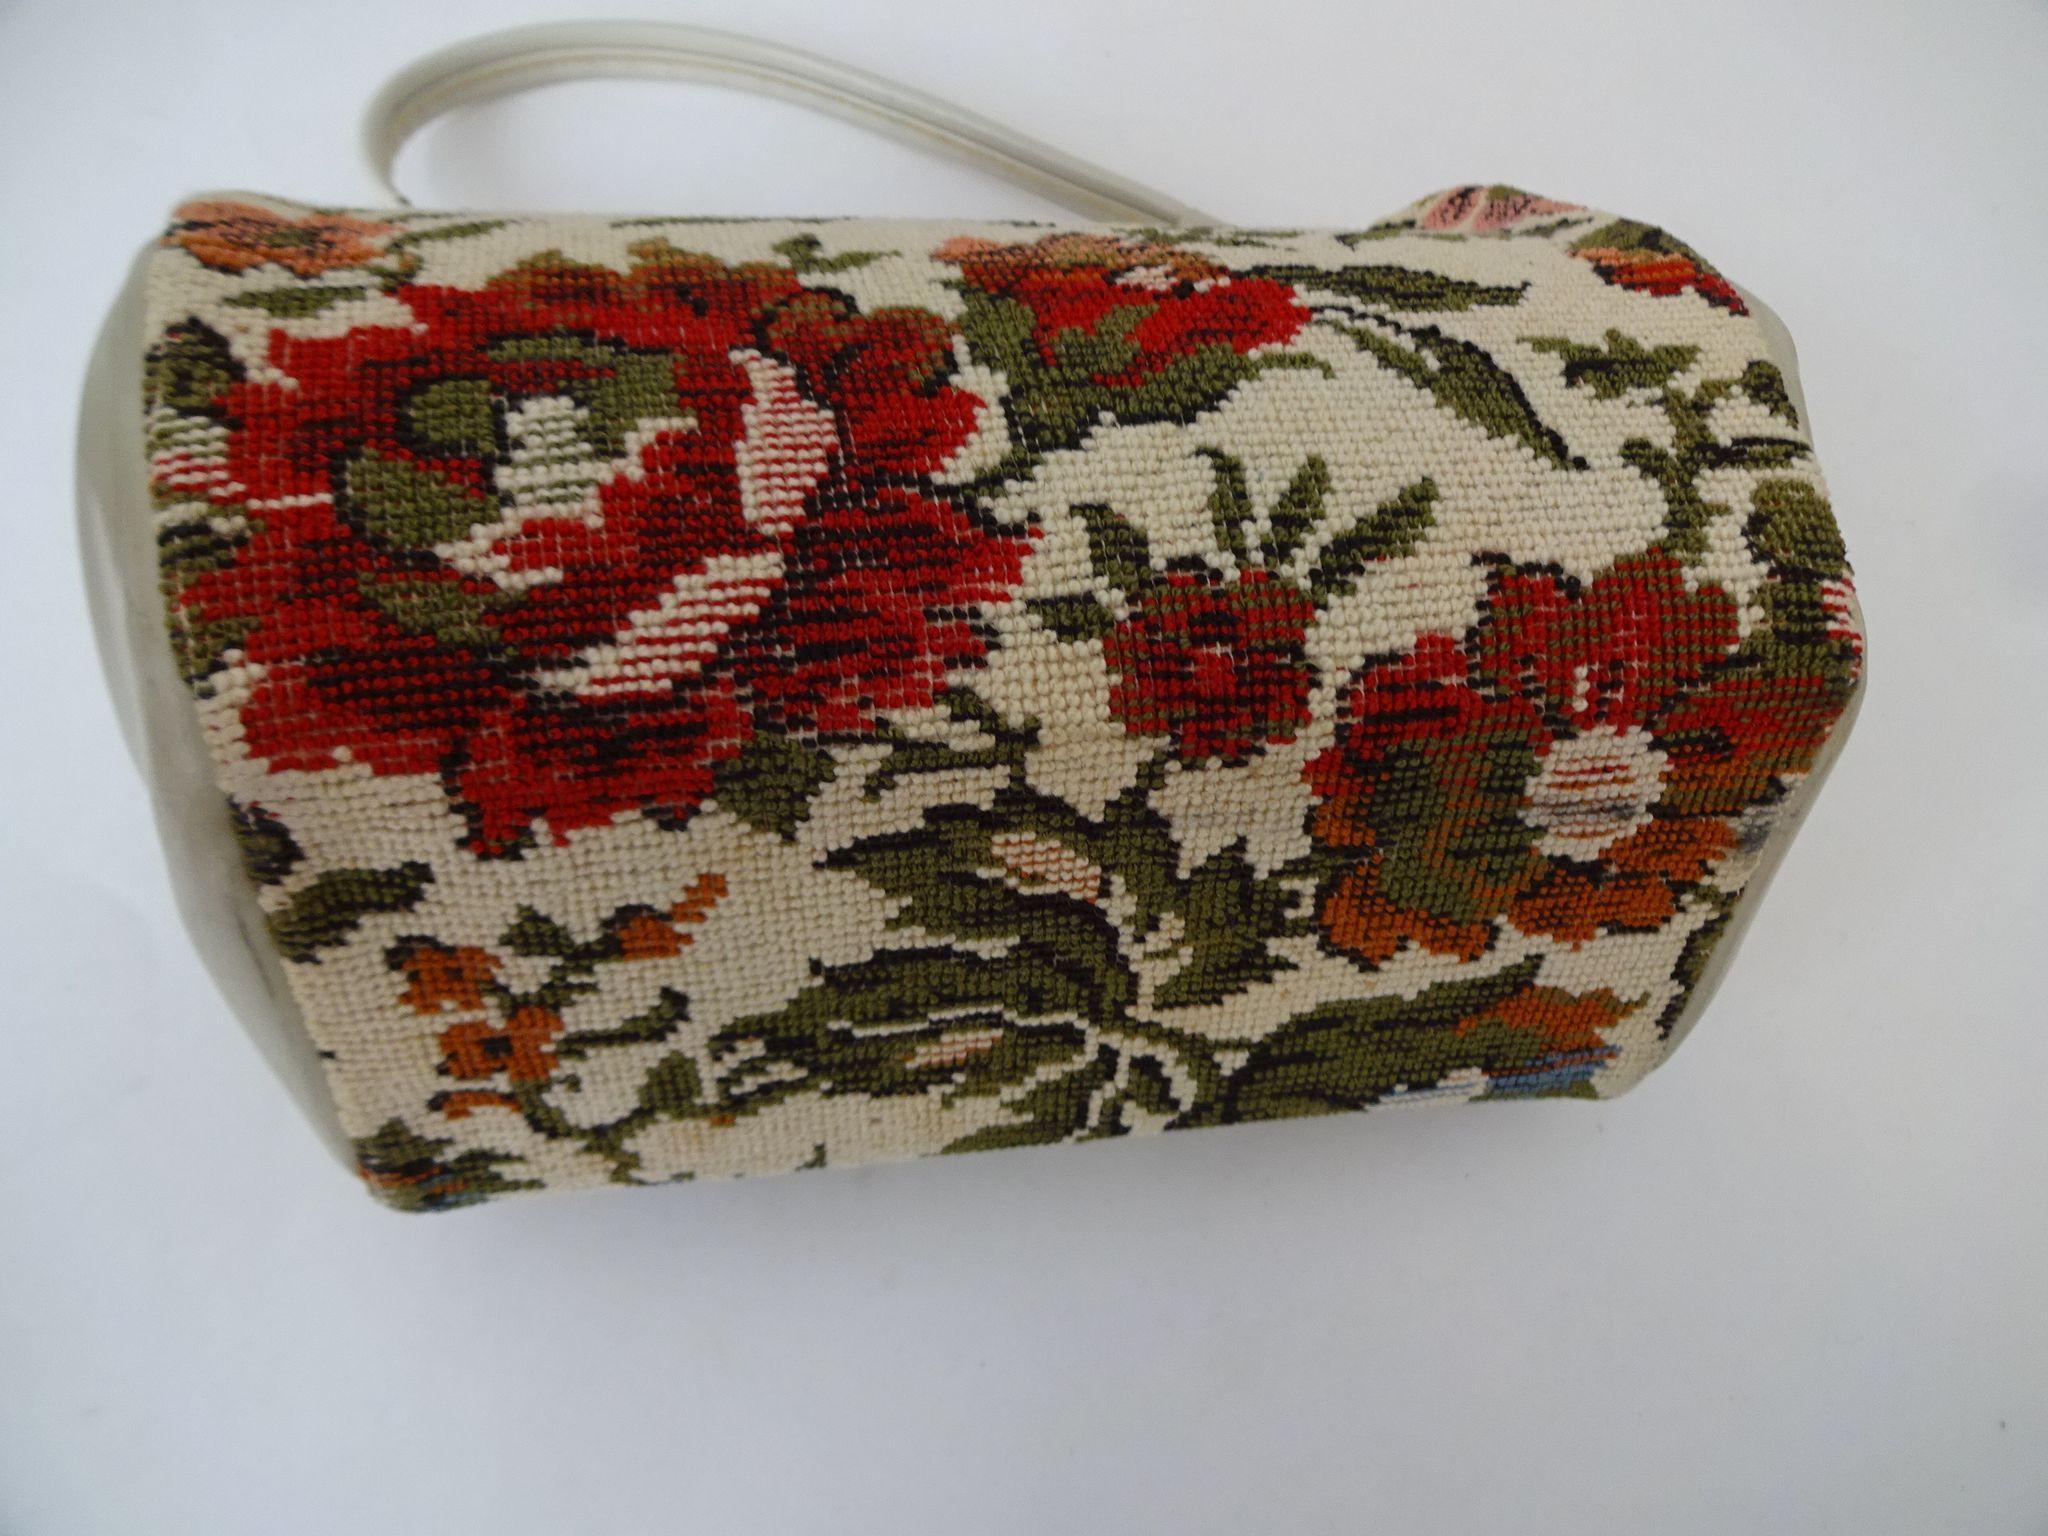 tapestry floral carpet bag purse vintage 1960s ivory womens handbag   vanity flair vintage